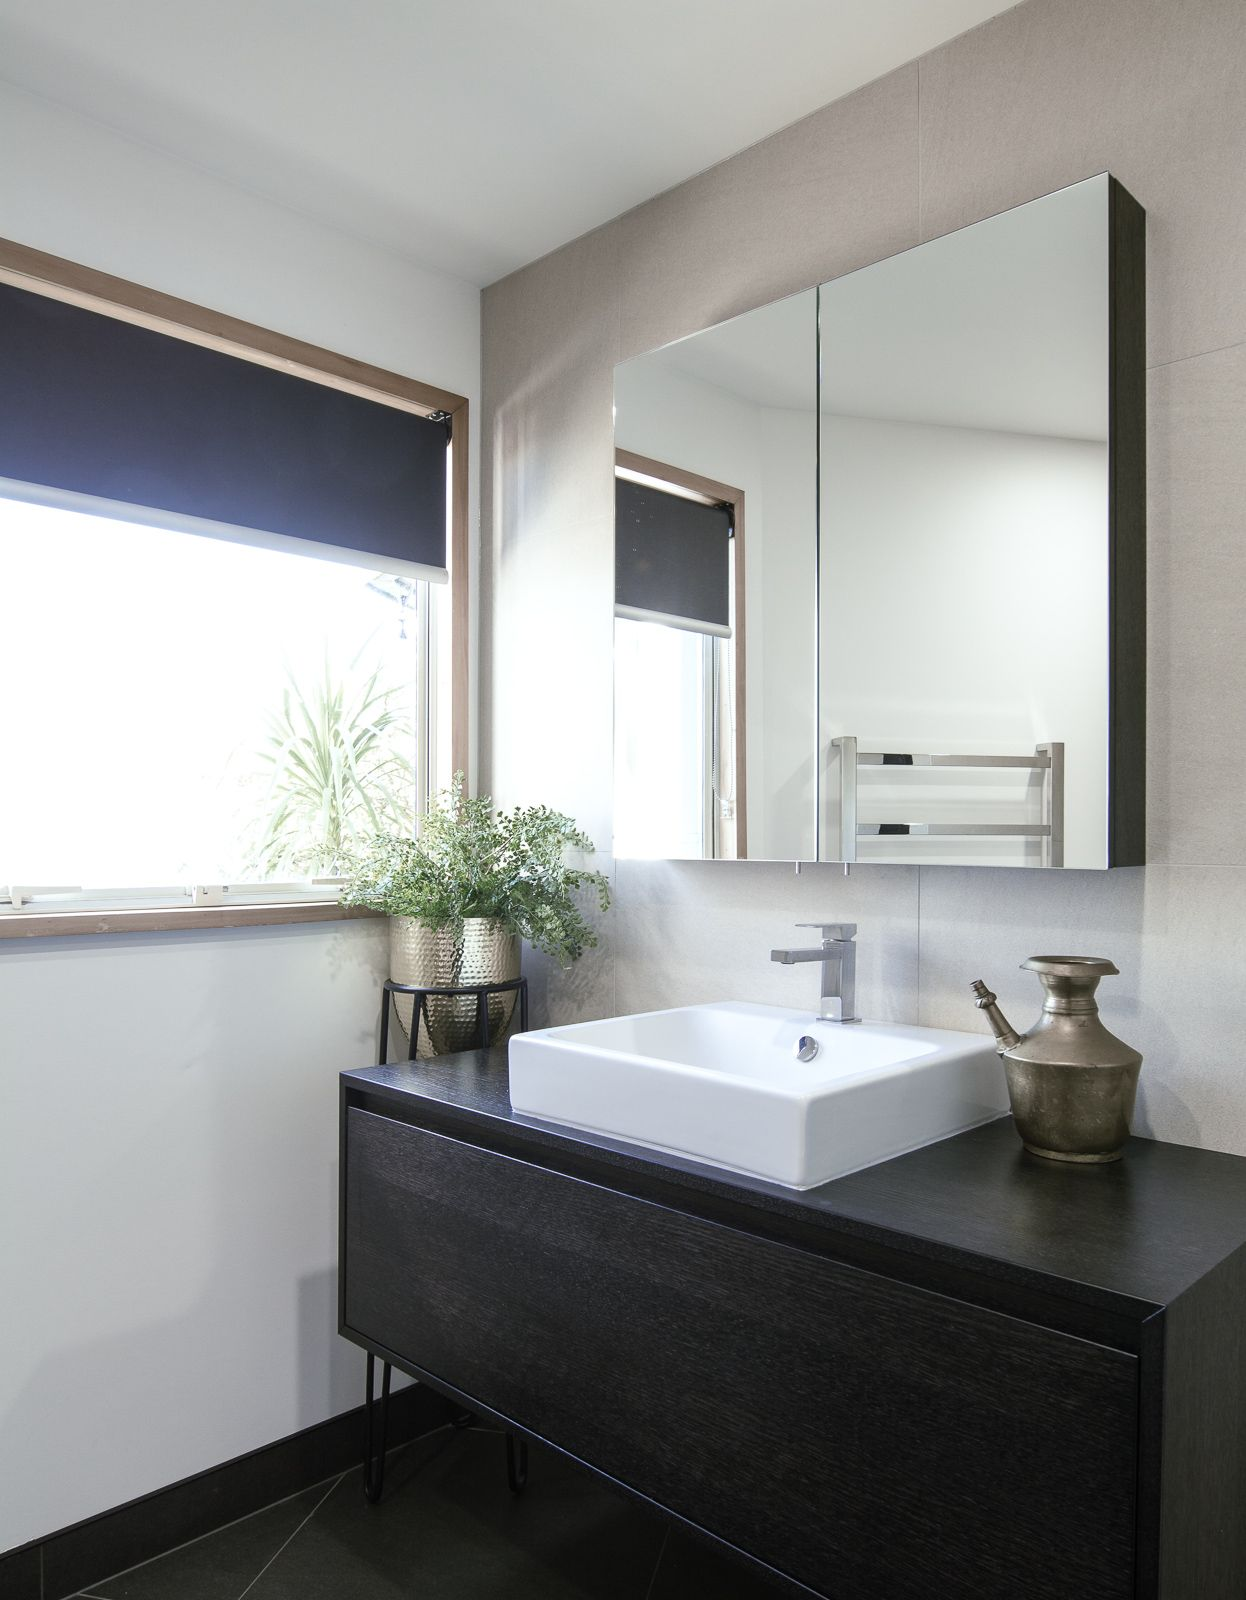 past bathroom interior design projects surfacedesign on bathroom renovation ideas nz id=44264